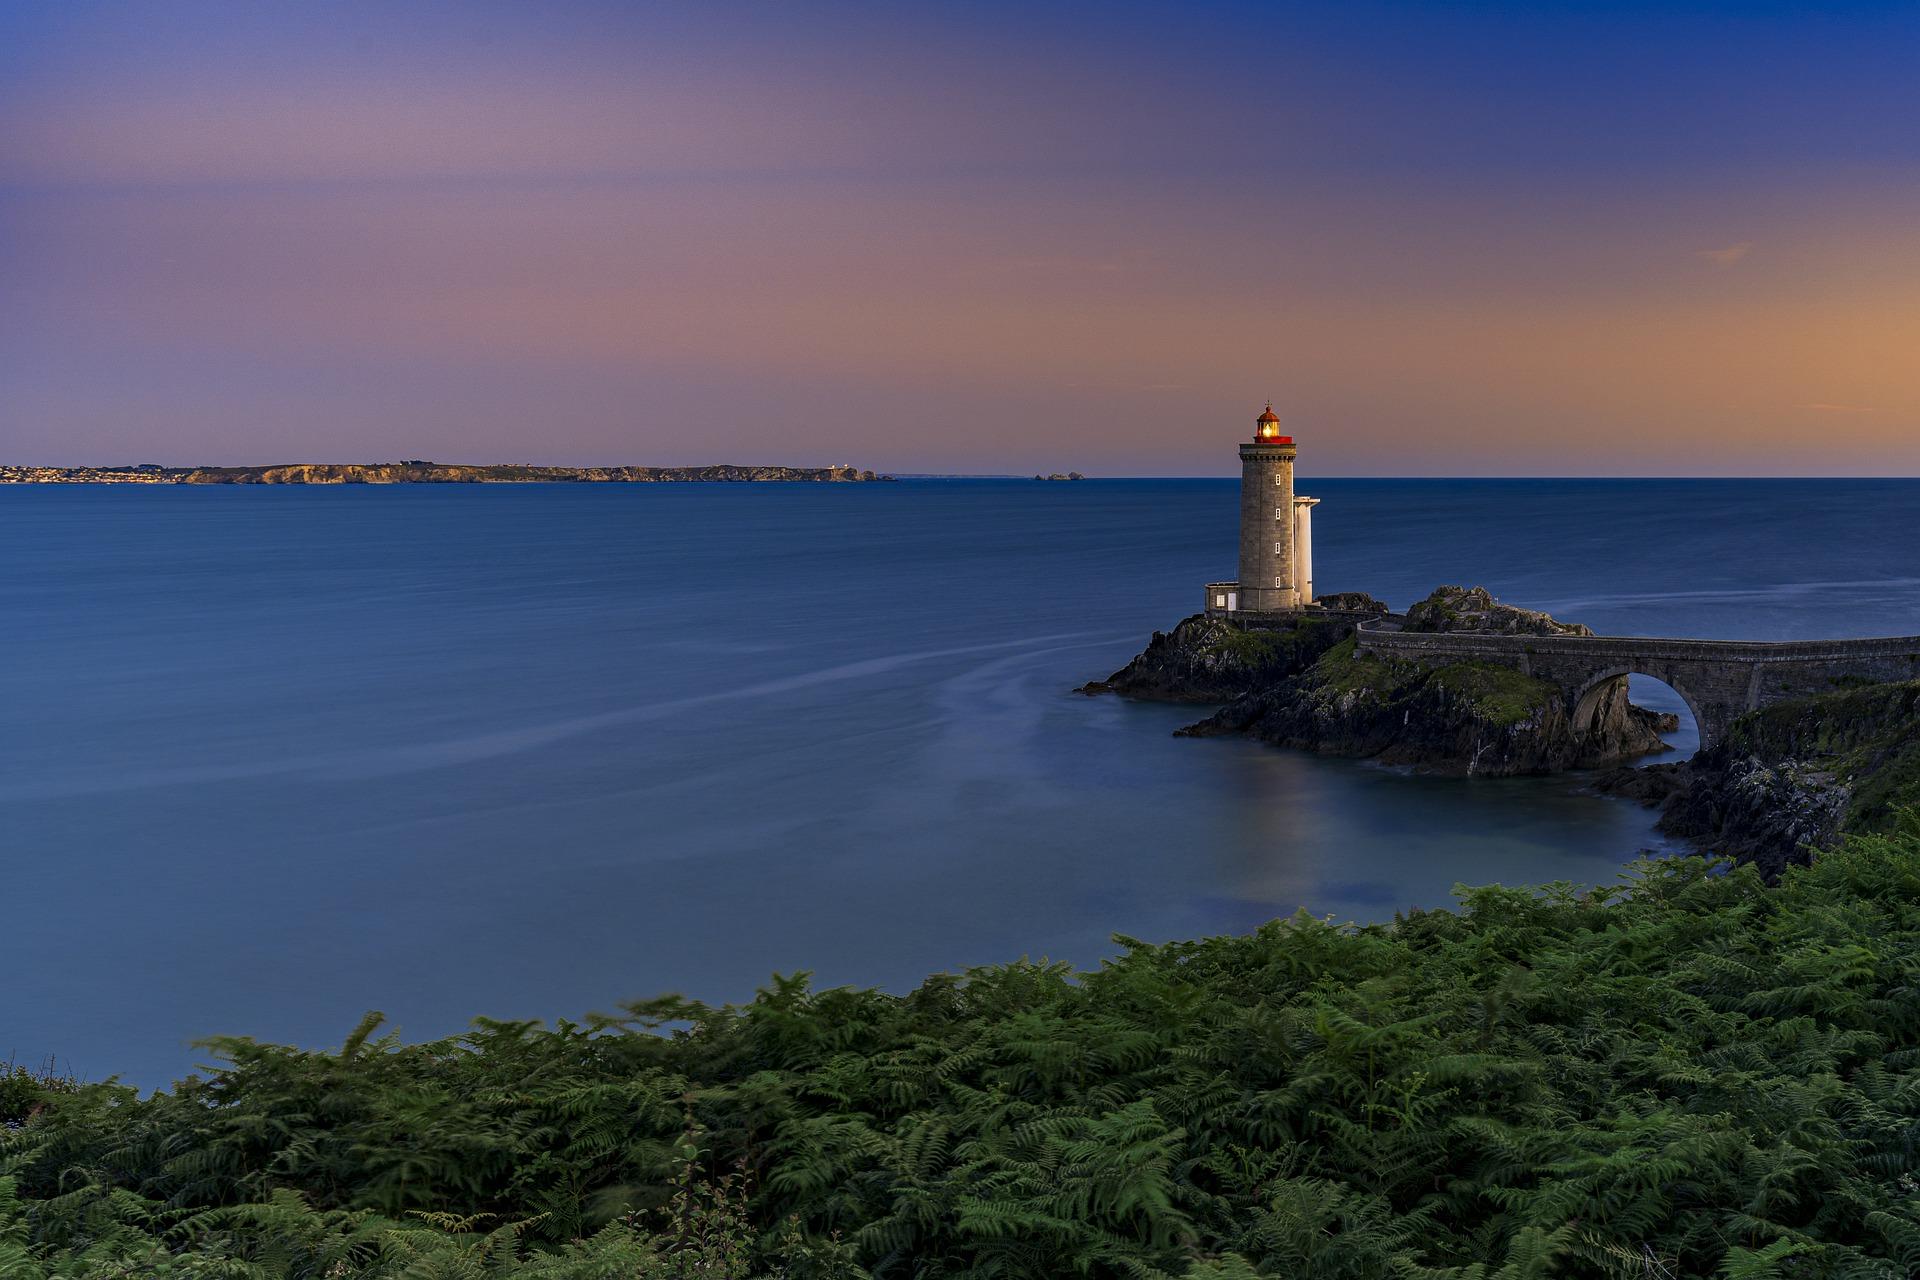 frankreich-atlantik-küste-leuchtturm